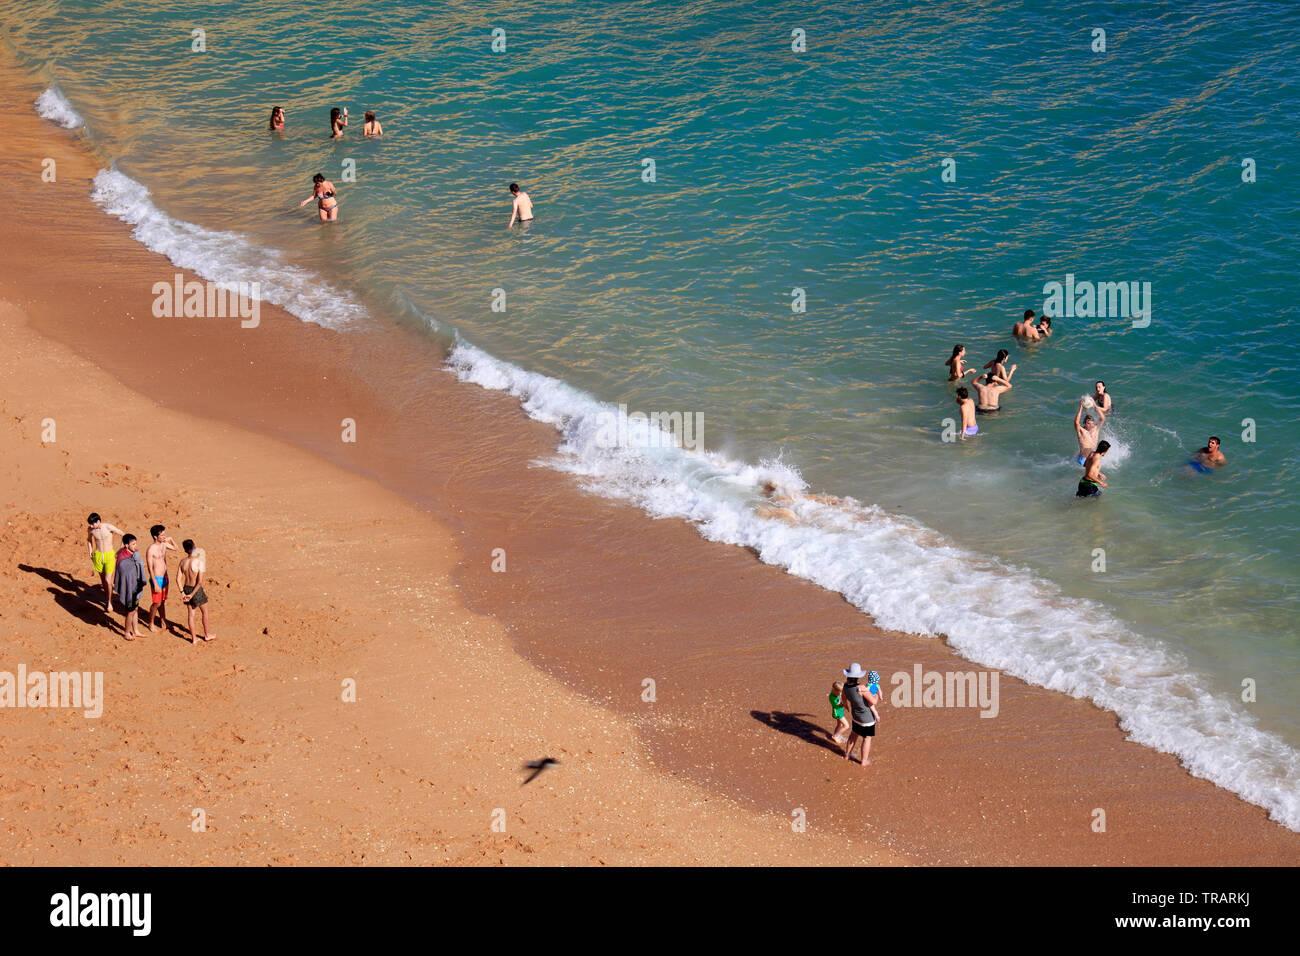 Portugal, Algarve, Carvoeiro, beach, people, Stock Photo